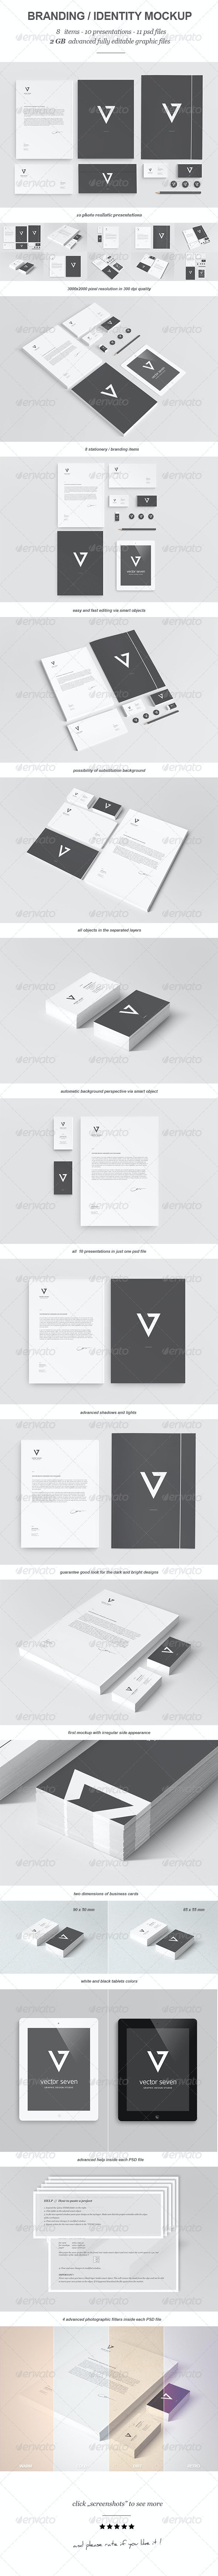 Branding / Identity Mock-up II - Stationery Print